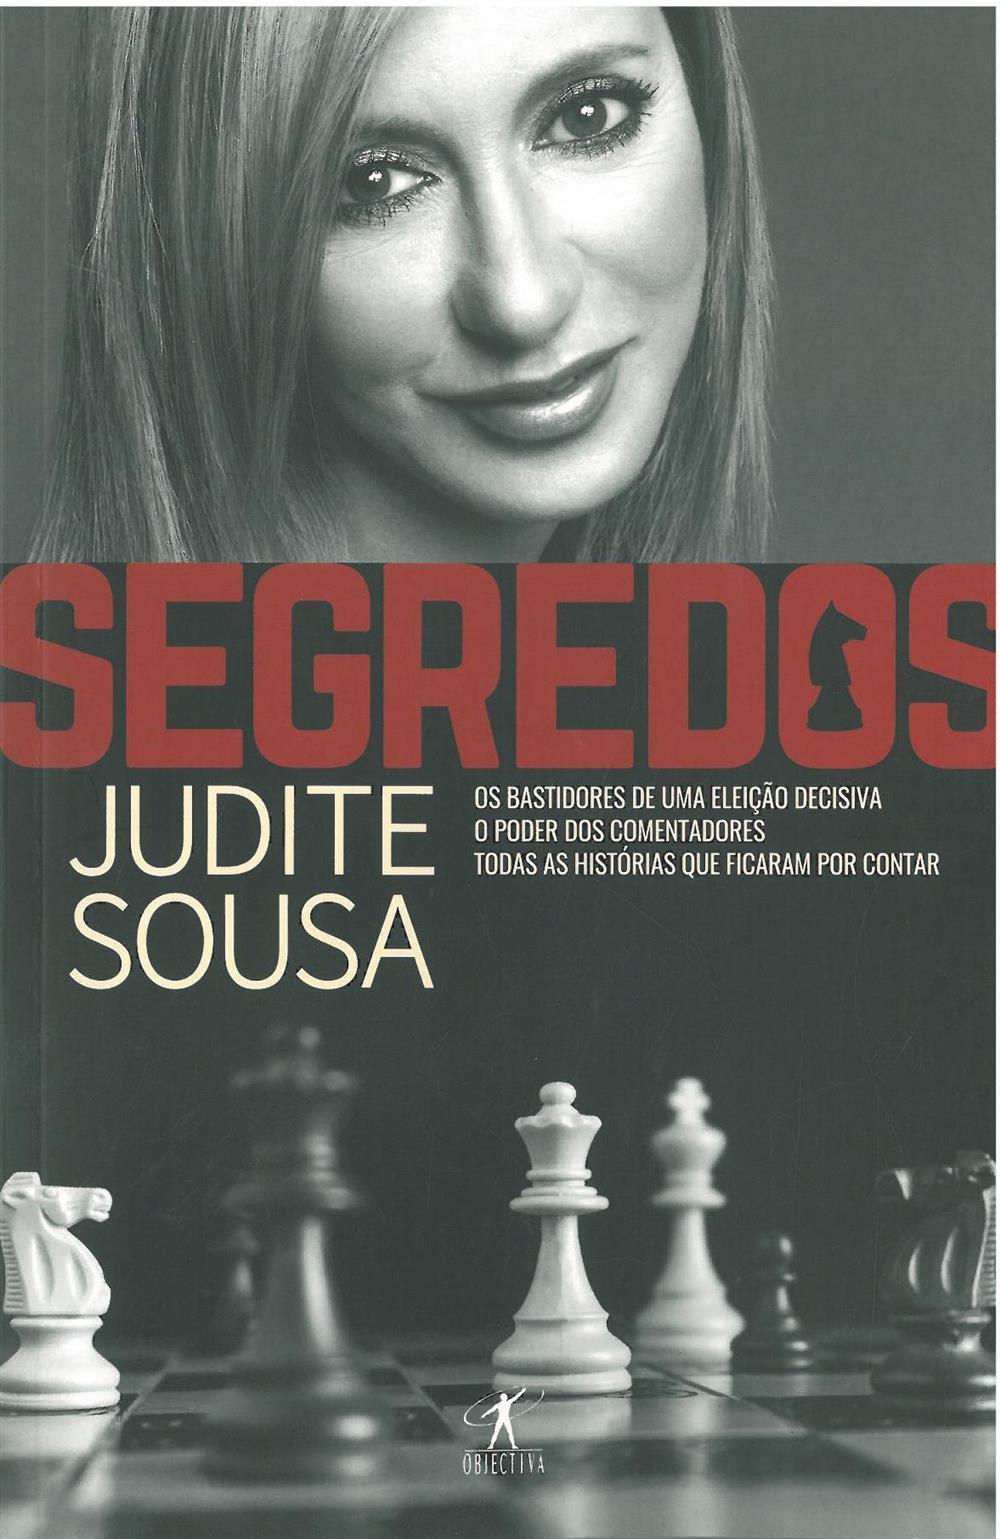 Segredos_.jpg